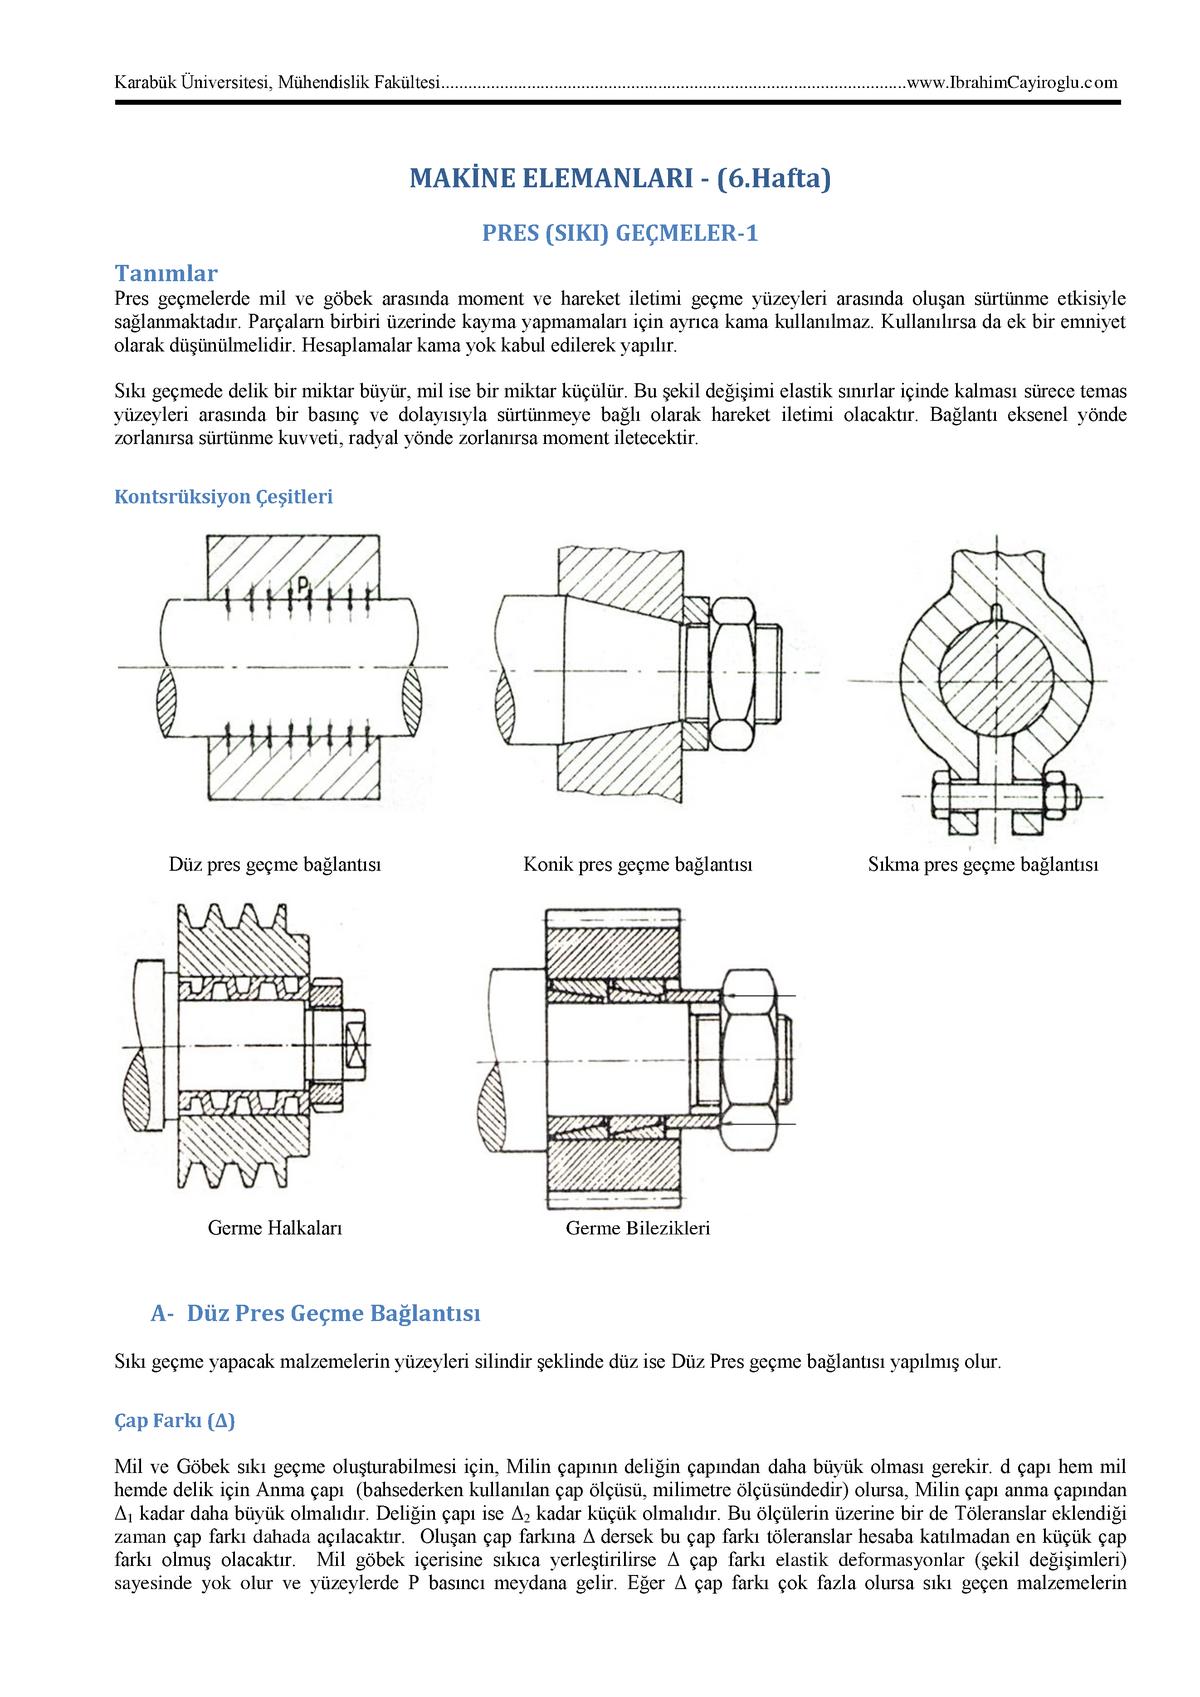 Makine Elemanlari Ders Notlari-6 - StuDocu